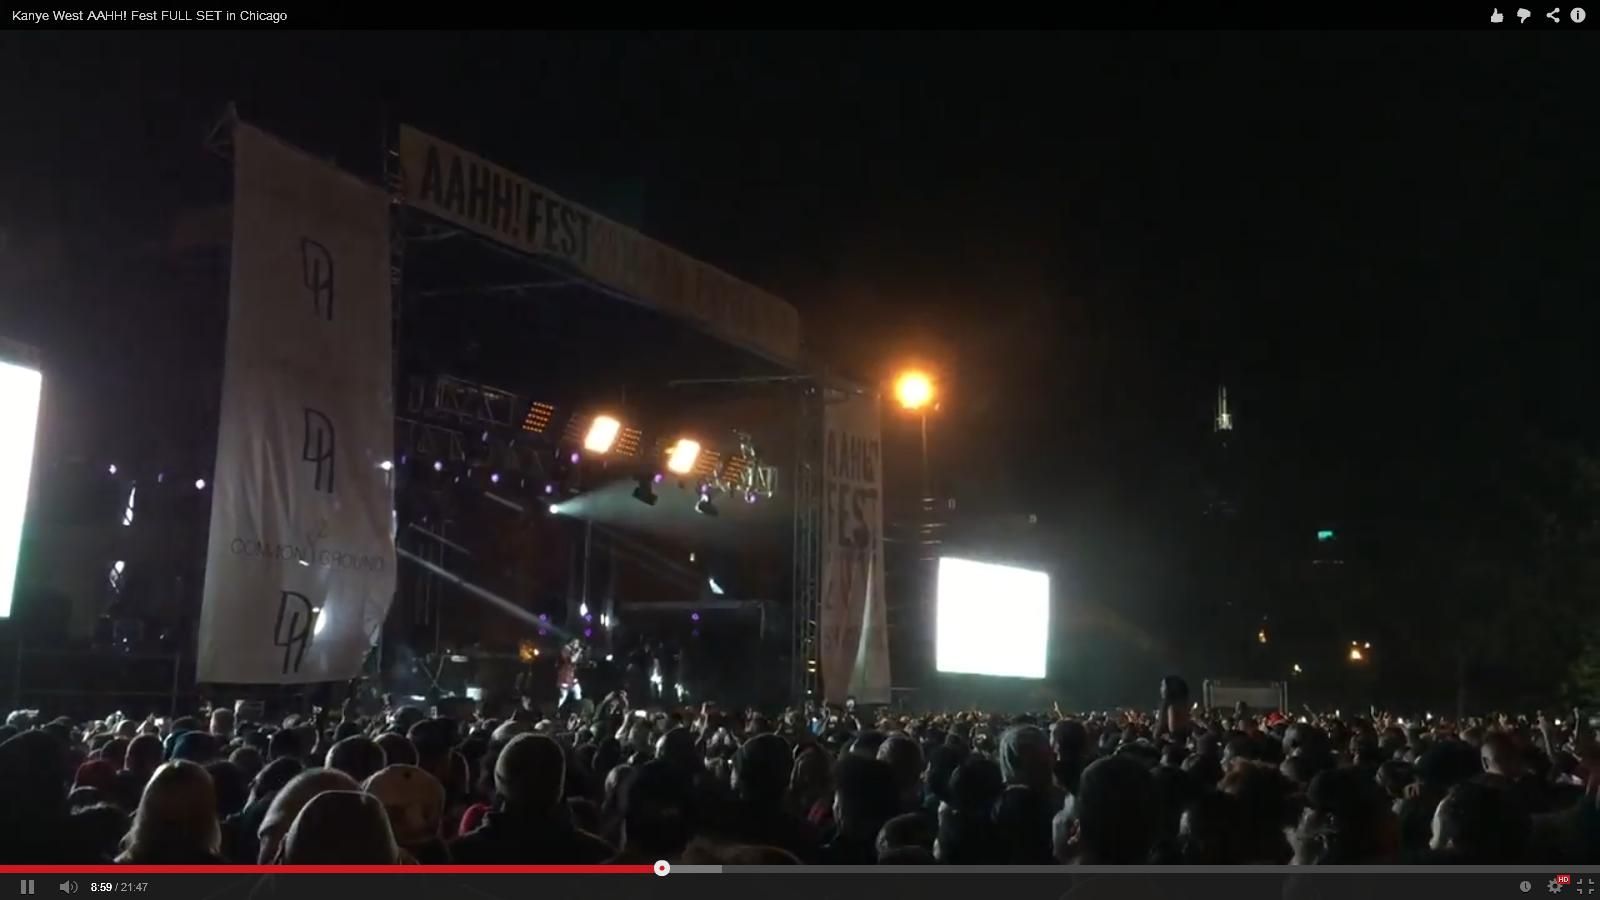 Screenshot 2014-09-22 22.42.01